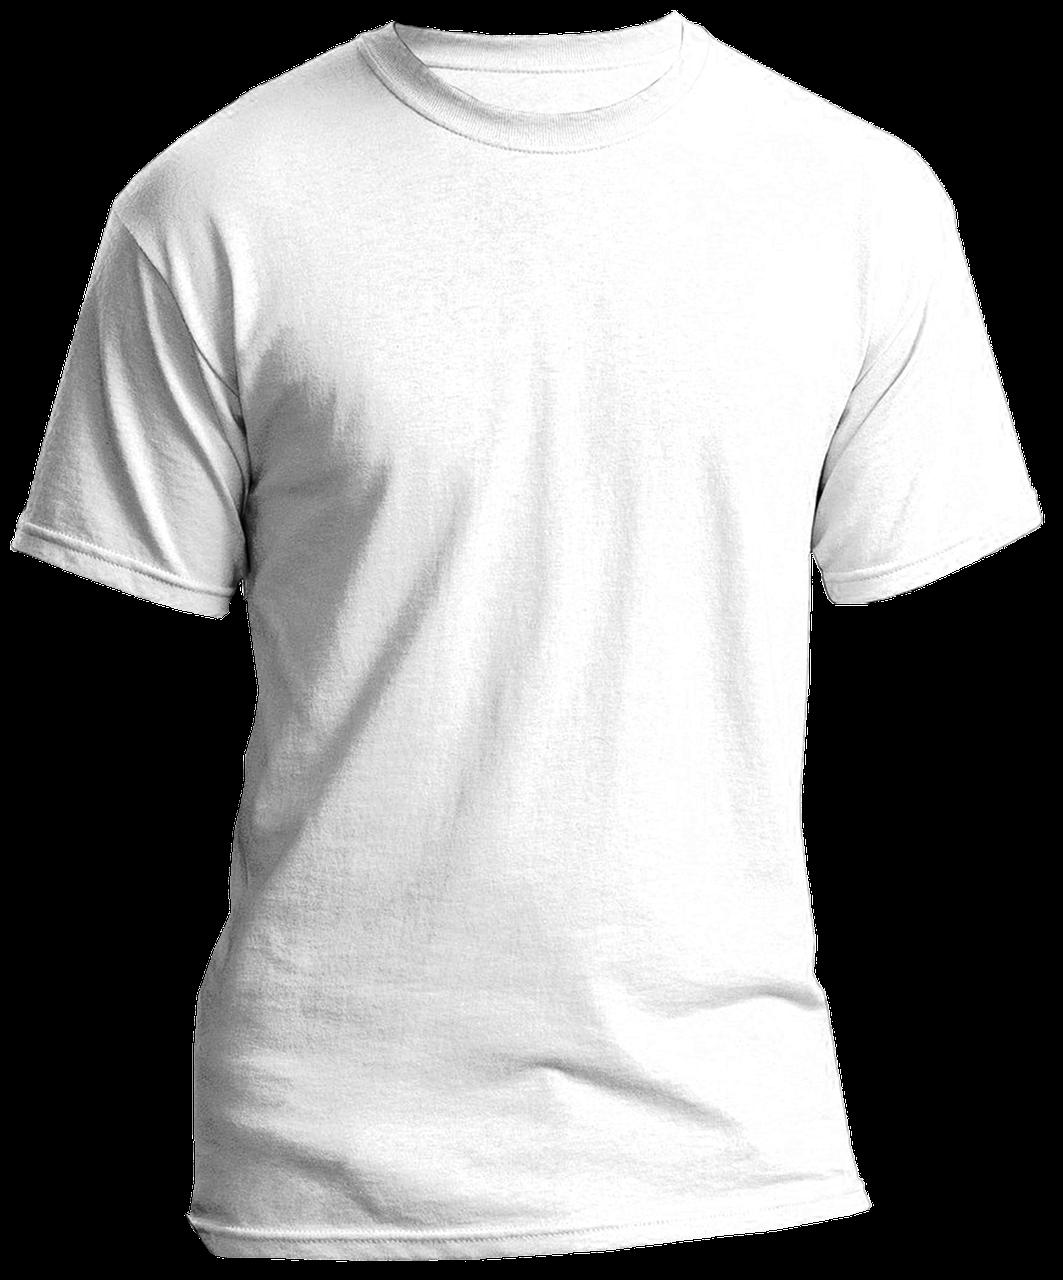 How To Buy Cruise Ship Shirts